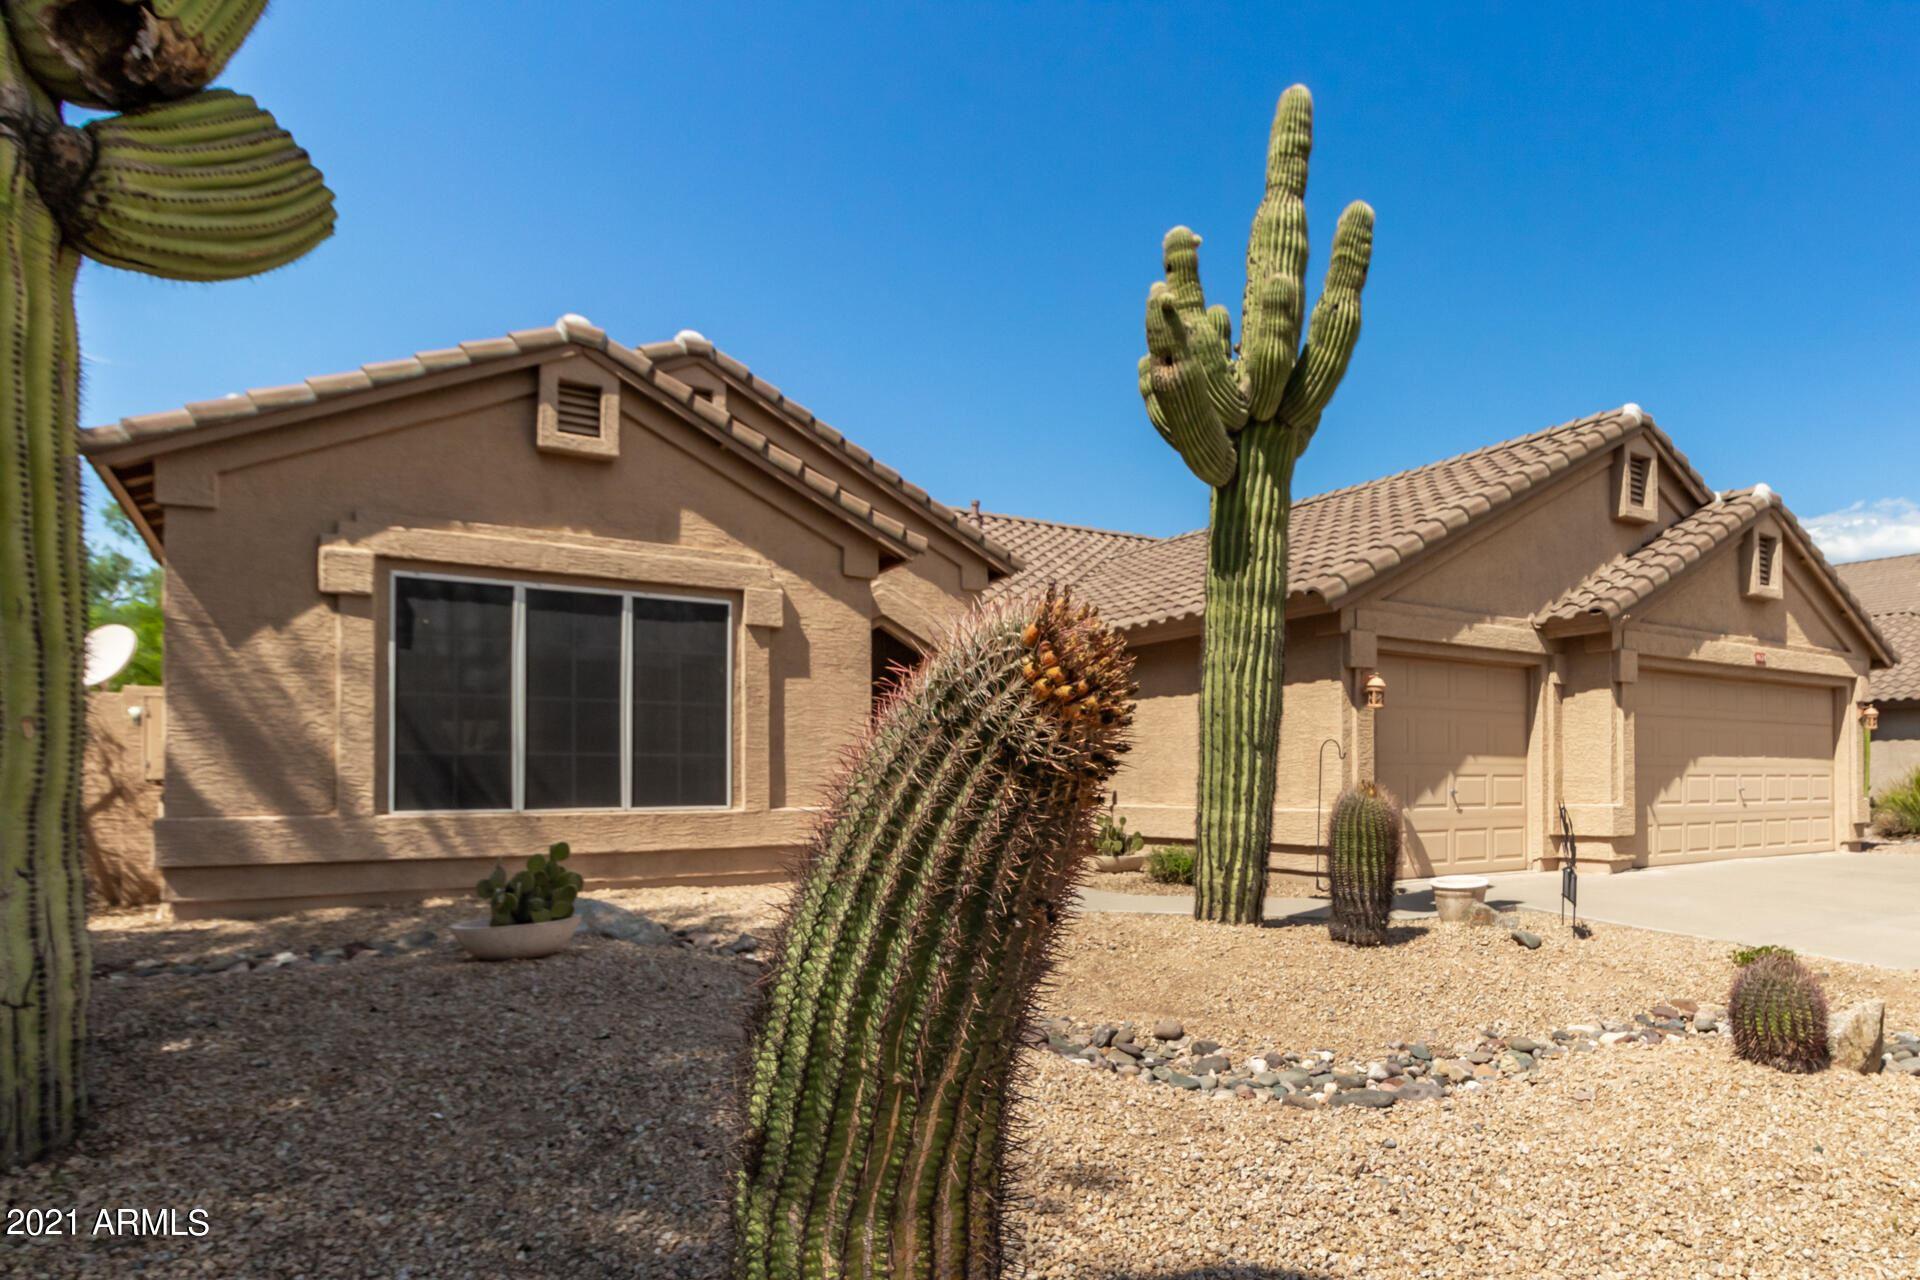 Photo of 4624 E HUNTER Court, Cave Creek, AZ 85331 (MLS # 6293051)